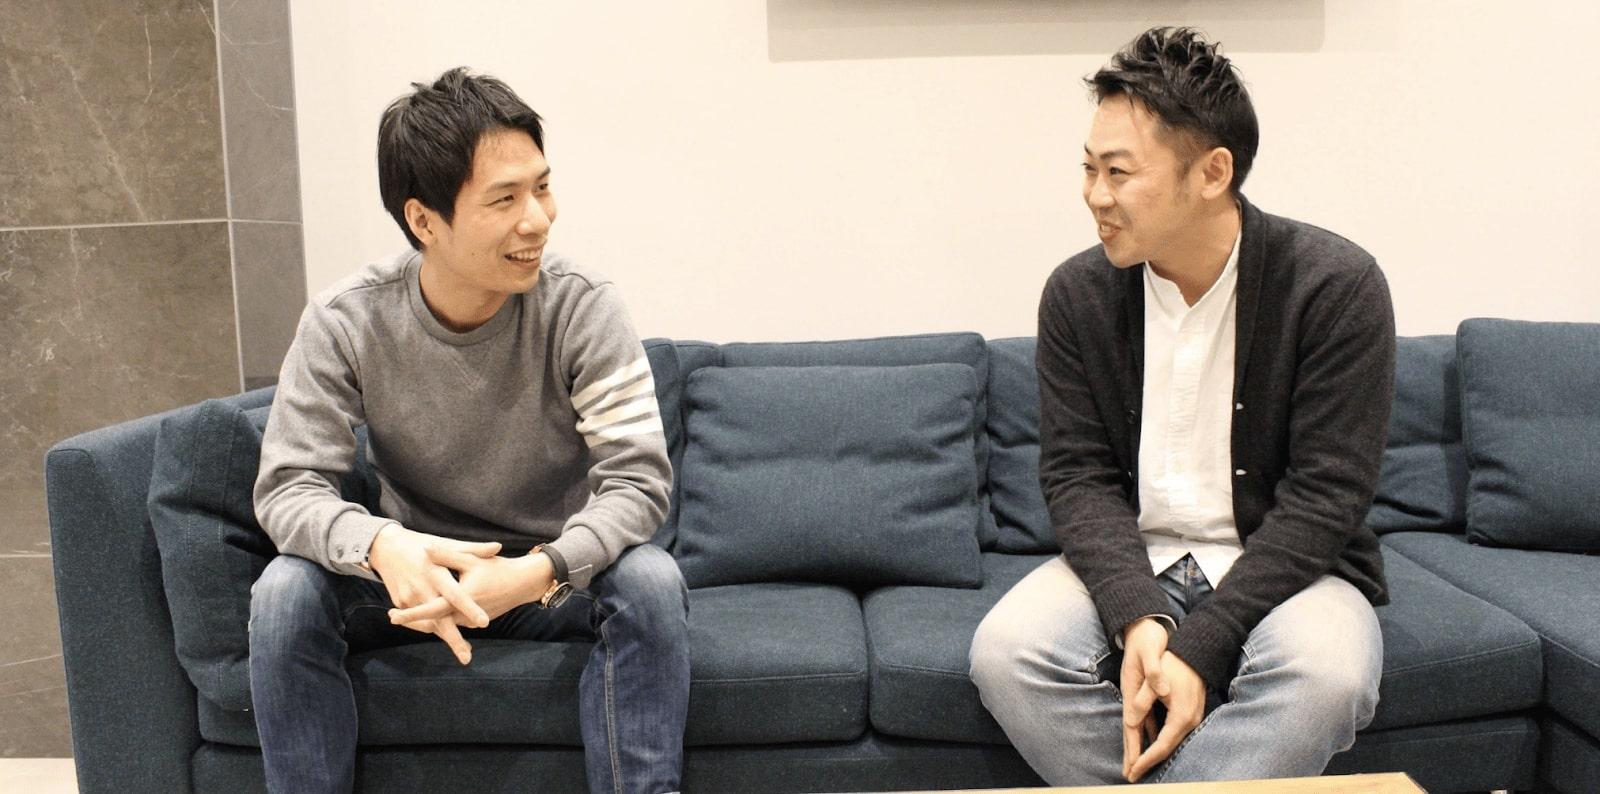 AnyMind Group and GROVE, CEO Sogo and CEO Kitajima meeting